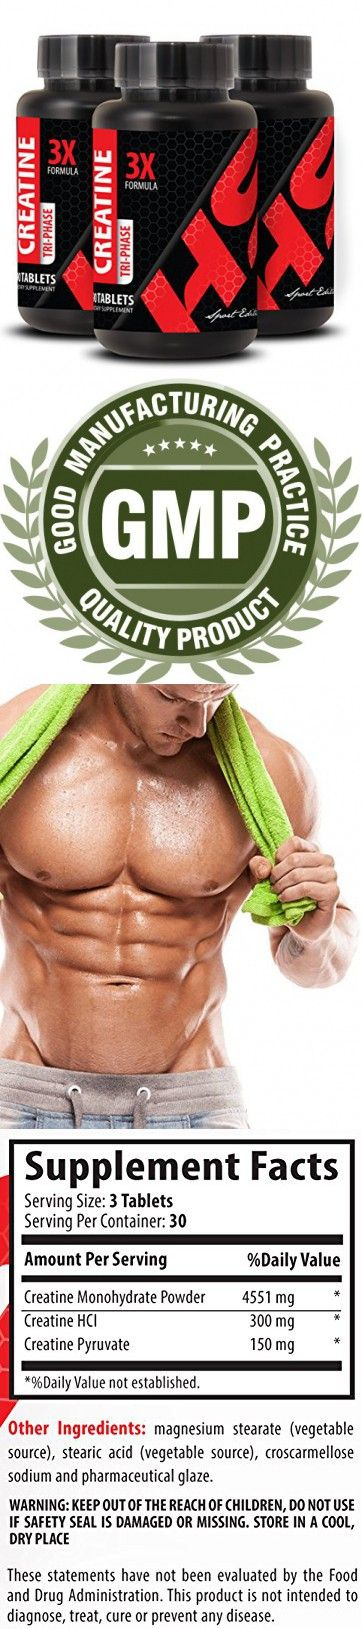 Workout supplements for men - CREATINE 3X POWERFUL FORMULA - Creatine for bodybuilding - 3 Bottles 270 Tablets